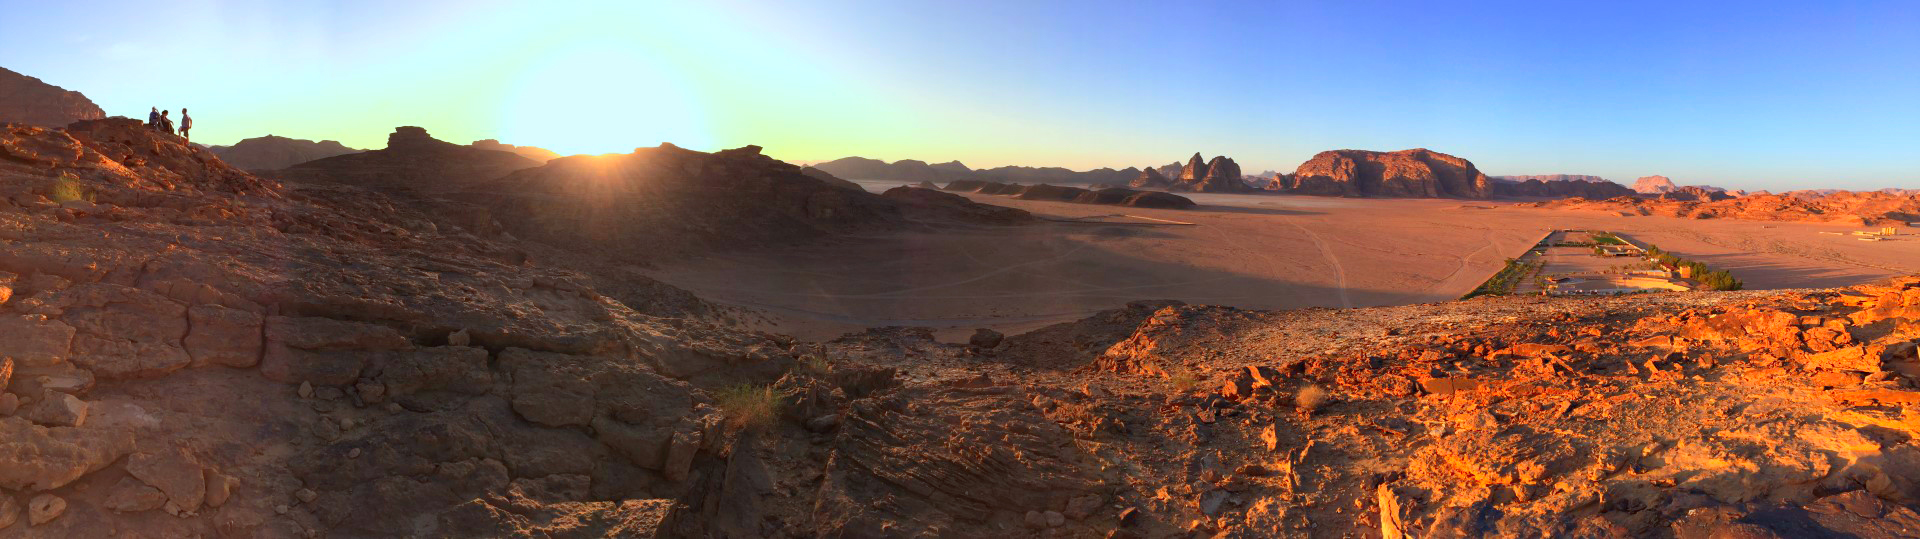 Qué ver en Wadi Rum: Desierto de Wadi Rum en Jordania qué ver en wadi rum - 28184864842 5f4a96a092 o - Qué ver en Wadi Rum, Jordania